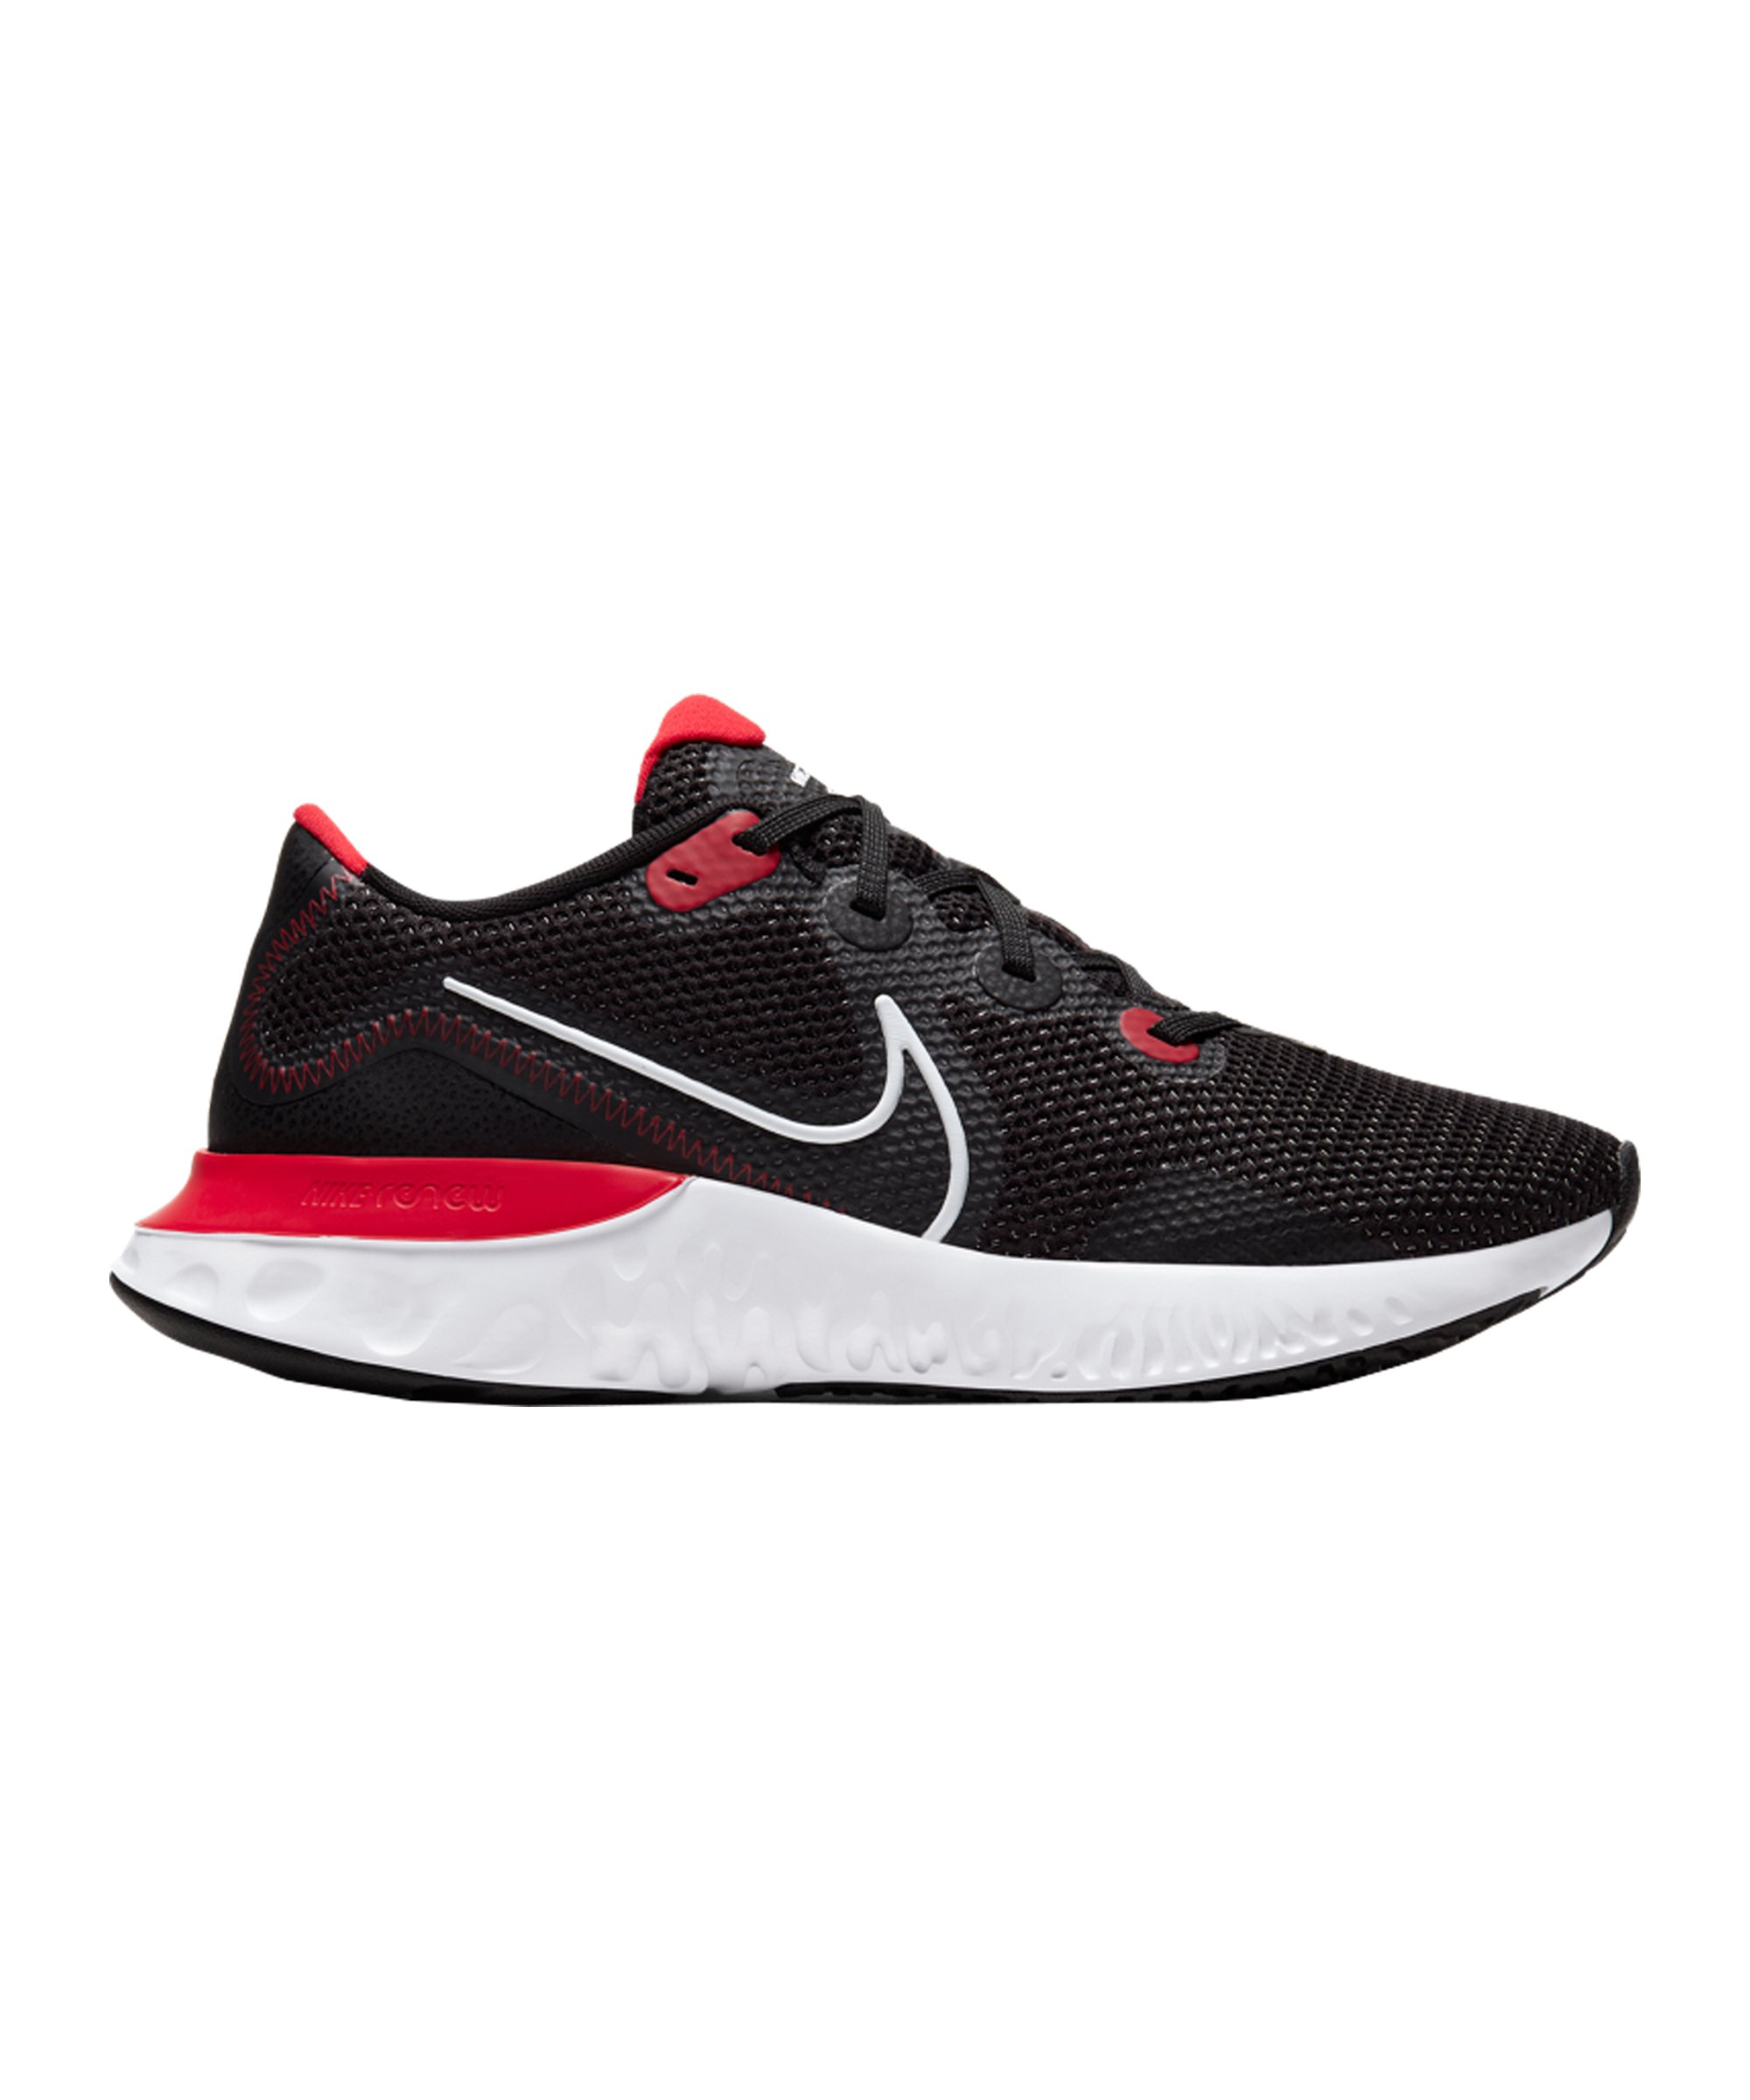 Nike Renew Run Running Schwarz F005 - schwarz